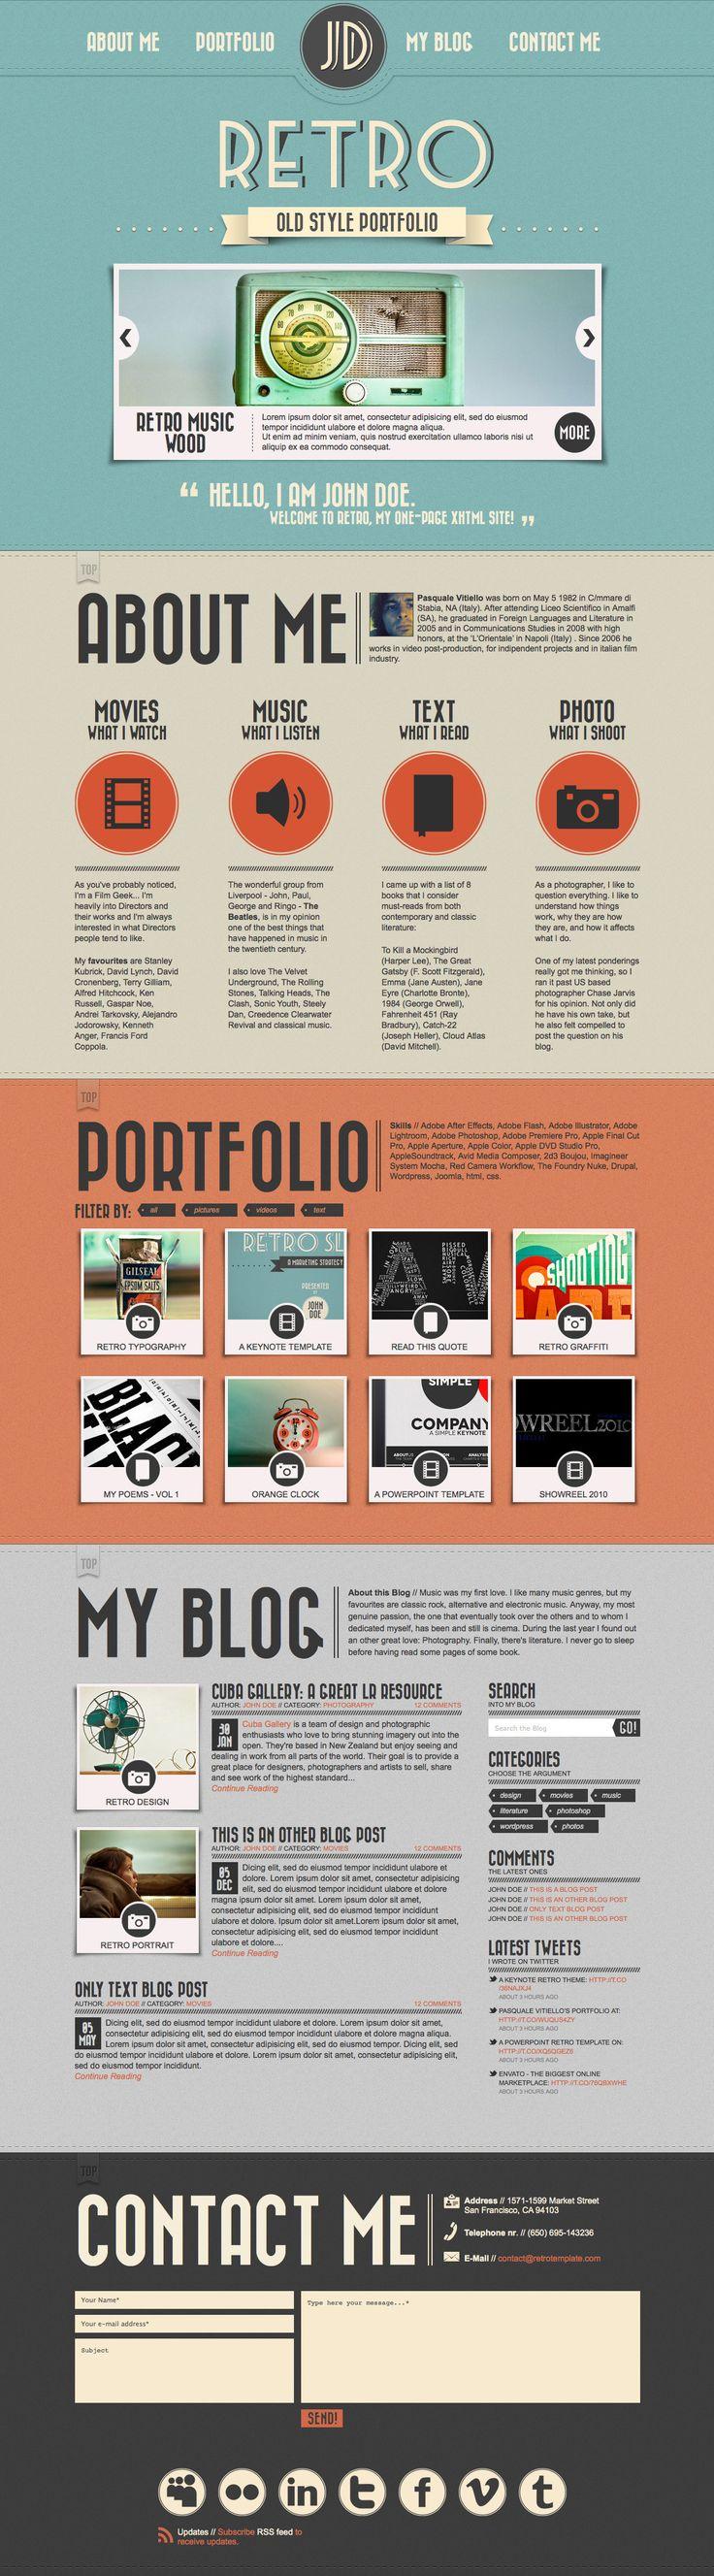 Retro Portfolio One Page Vintage WordPress